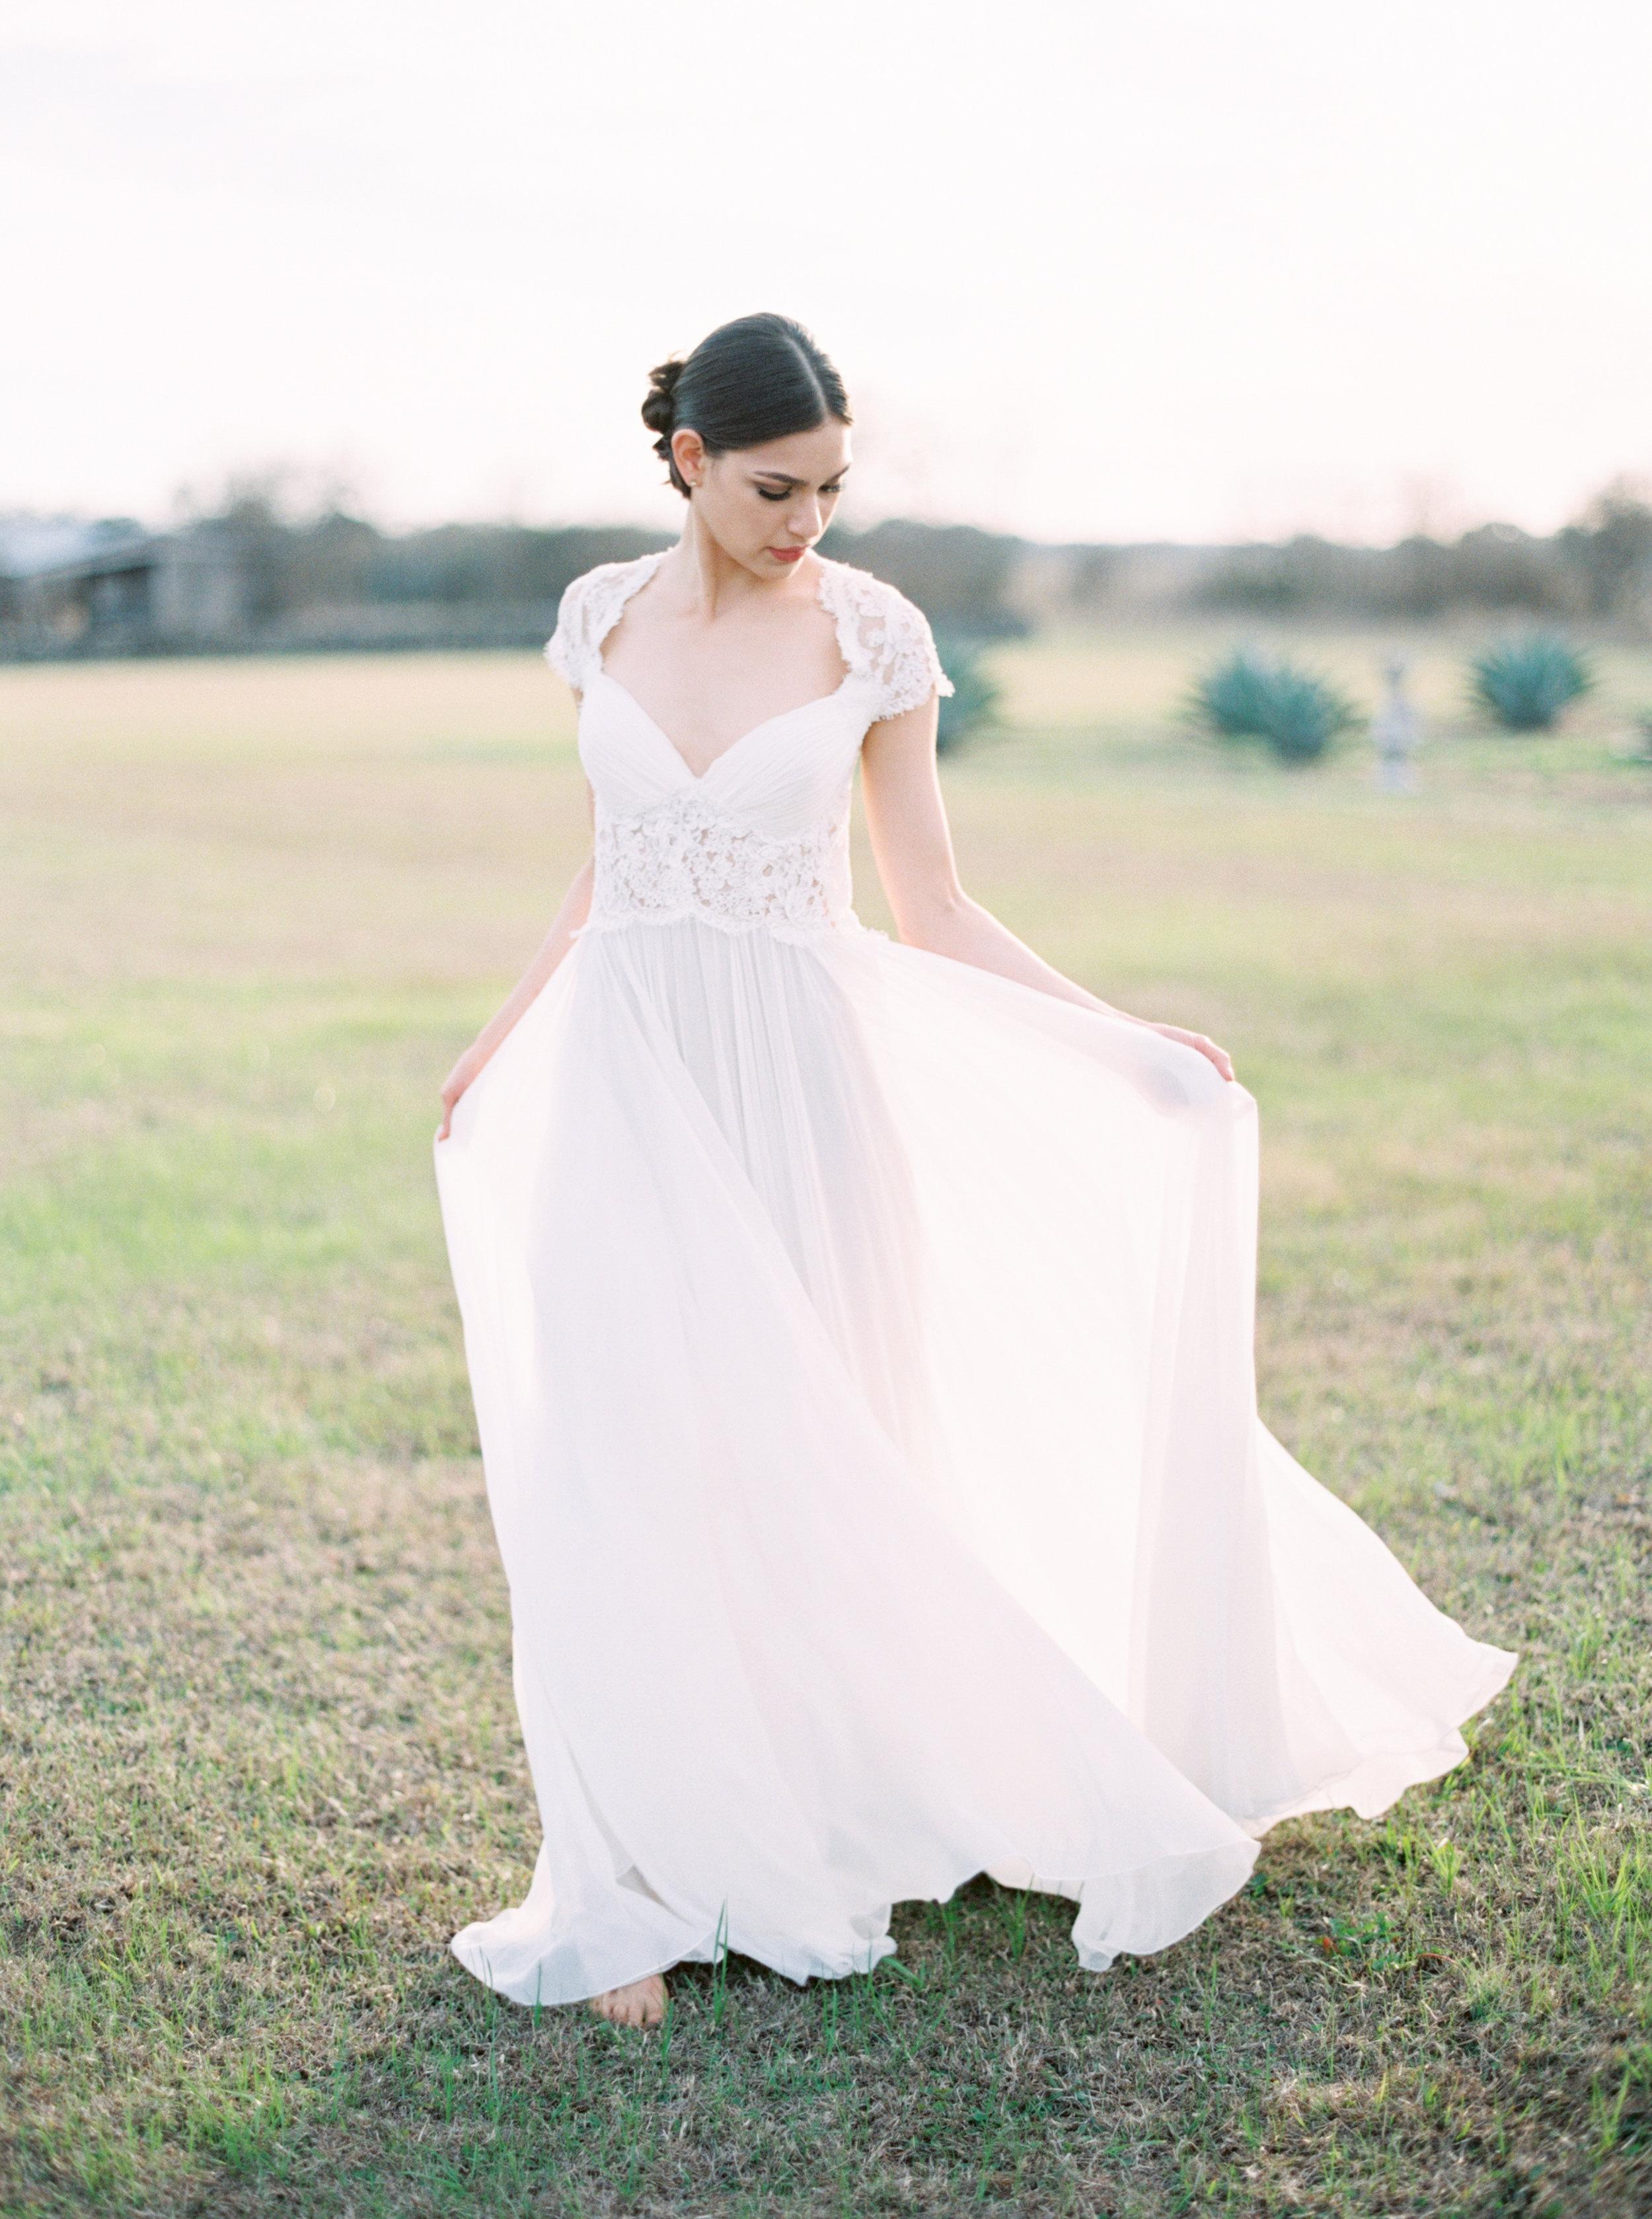 le san michele austin wedding photographer jenna mcelroy